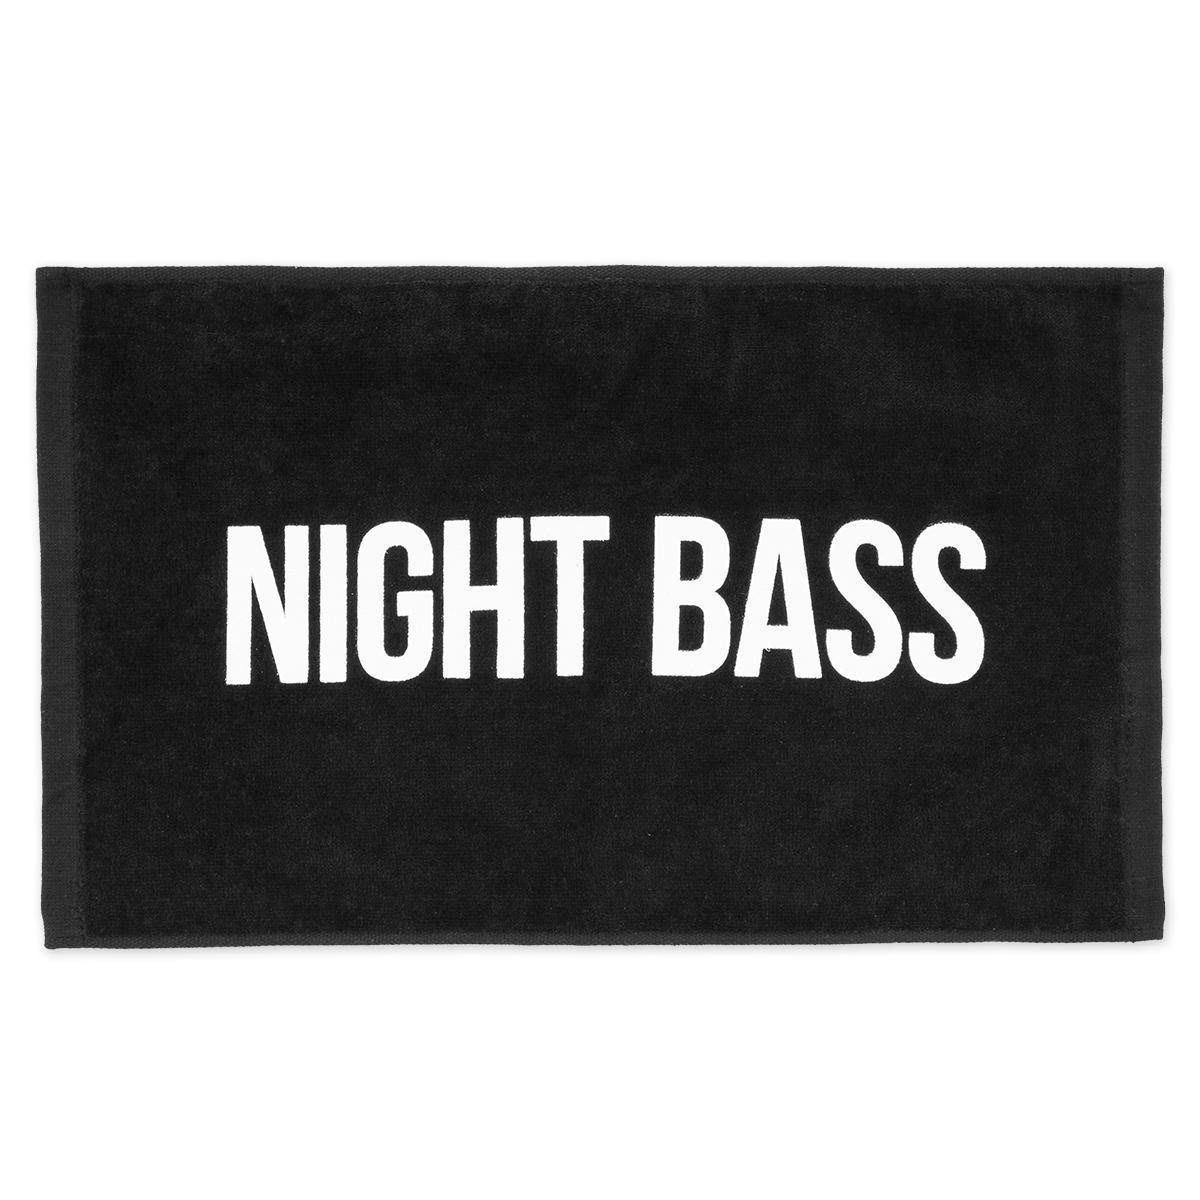 Night Bass Hand Towel